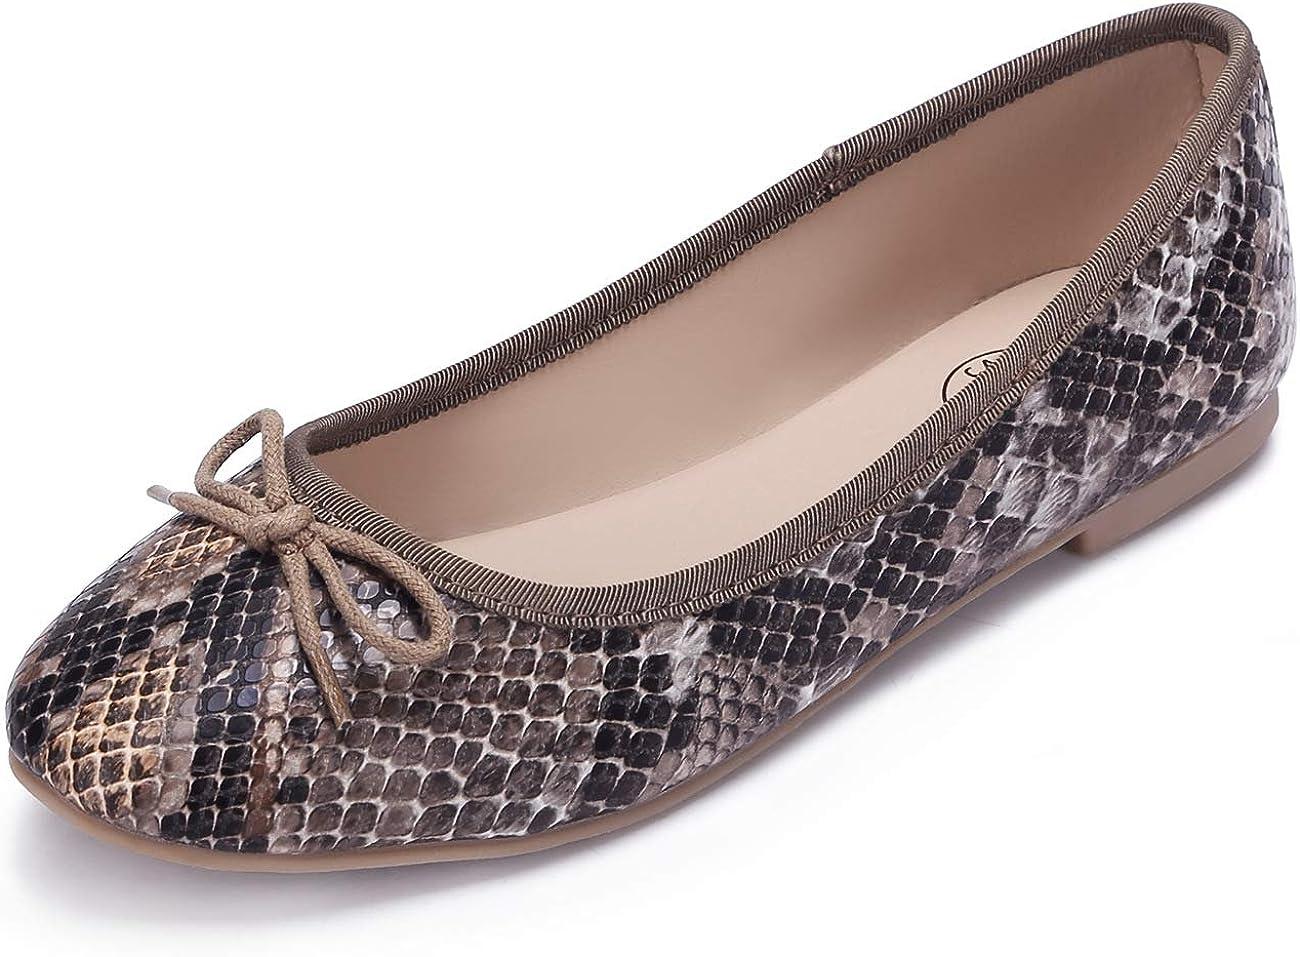 CAMEL CROWN Virginia Beach Mall Flat Shoes for Women Bowknot Dress Slip Popular brand Fau on